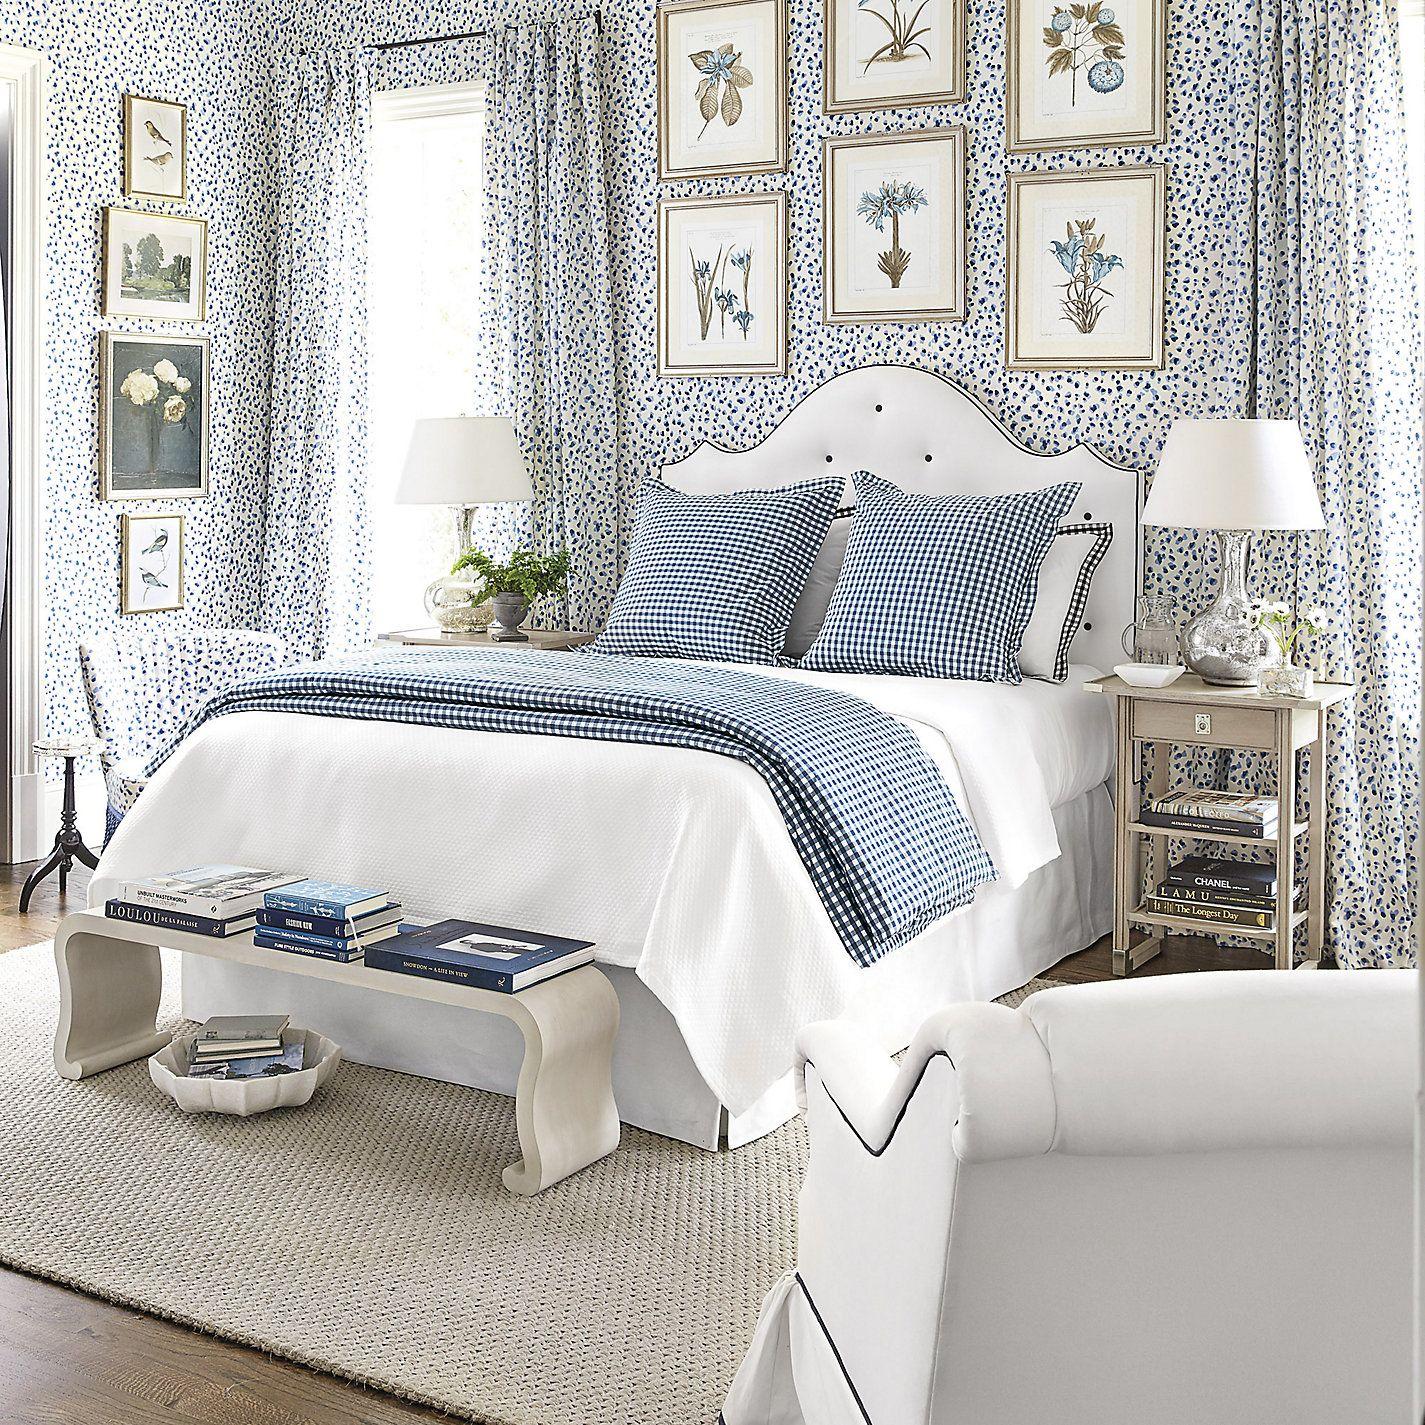 Ballard Designs Bed Skirts